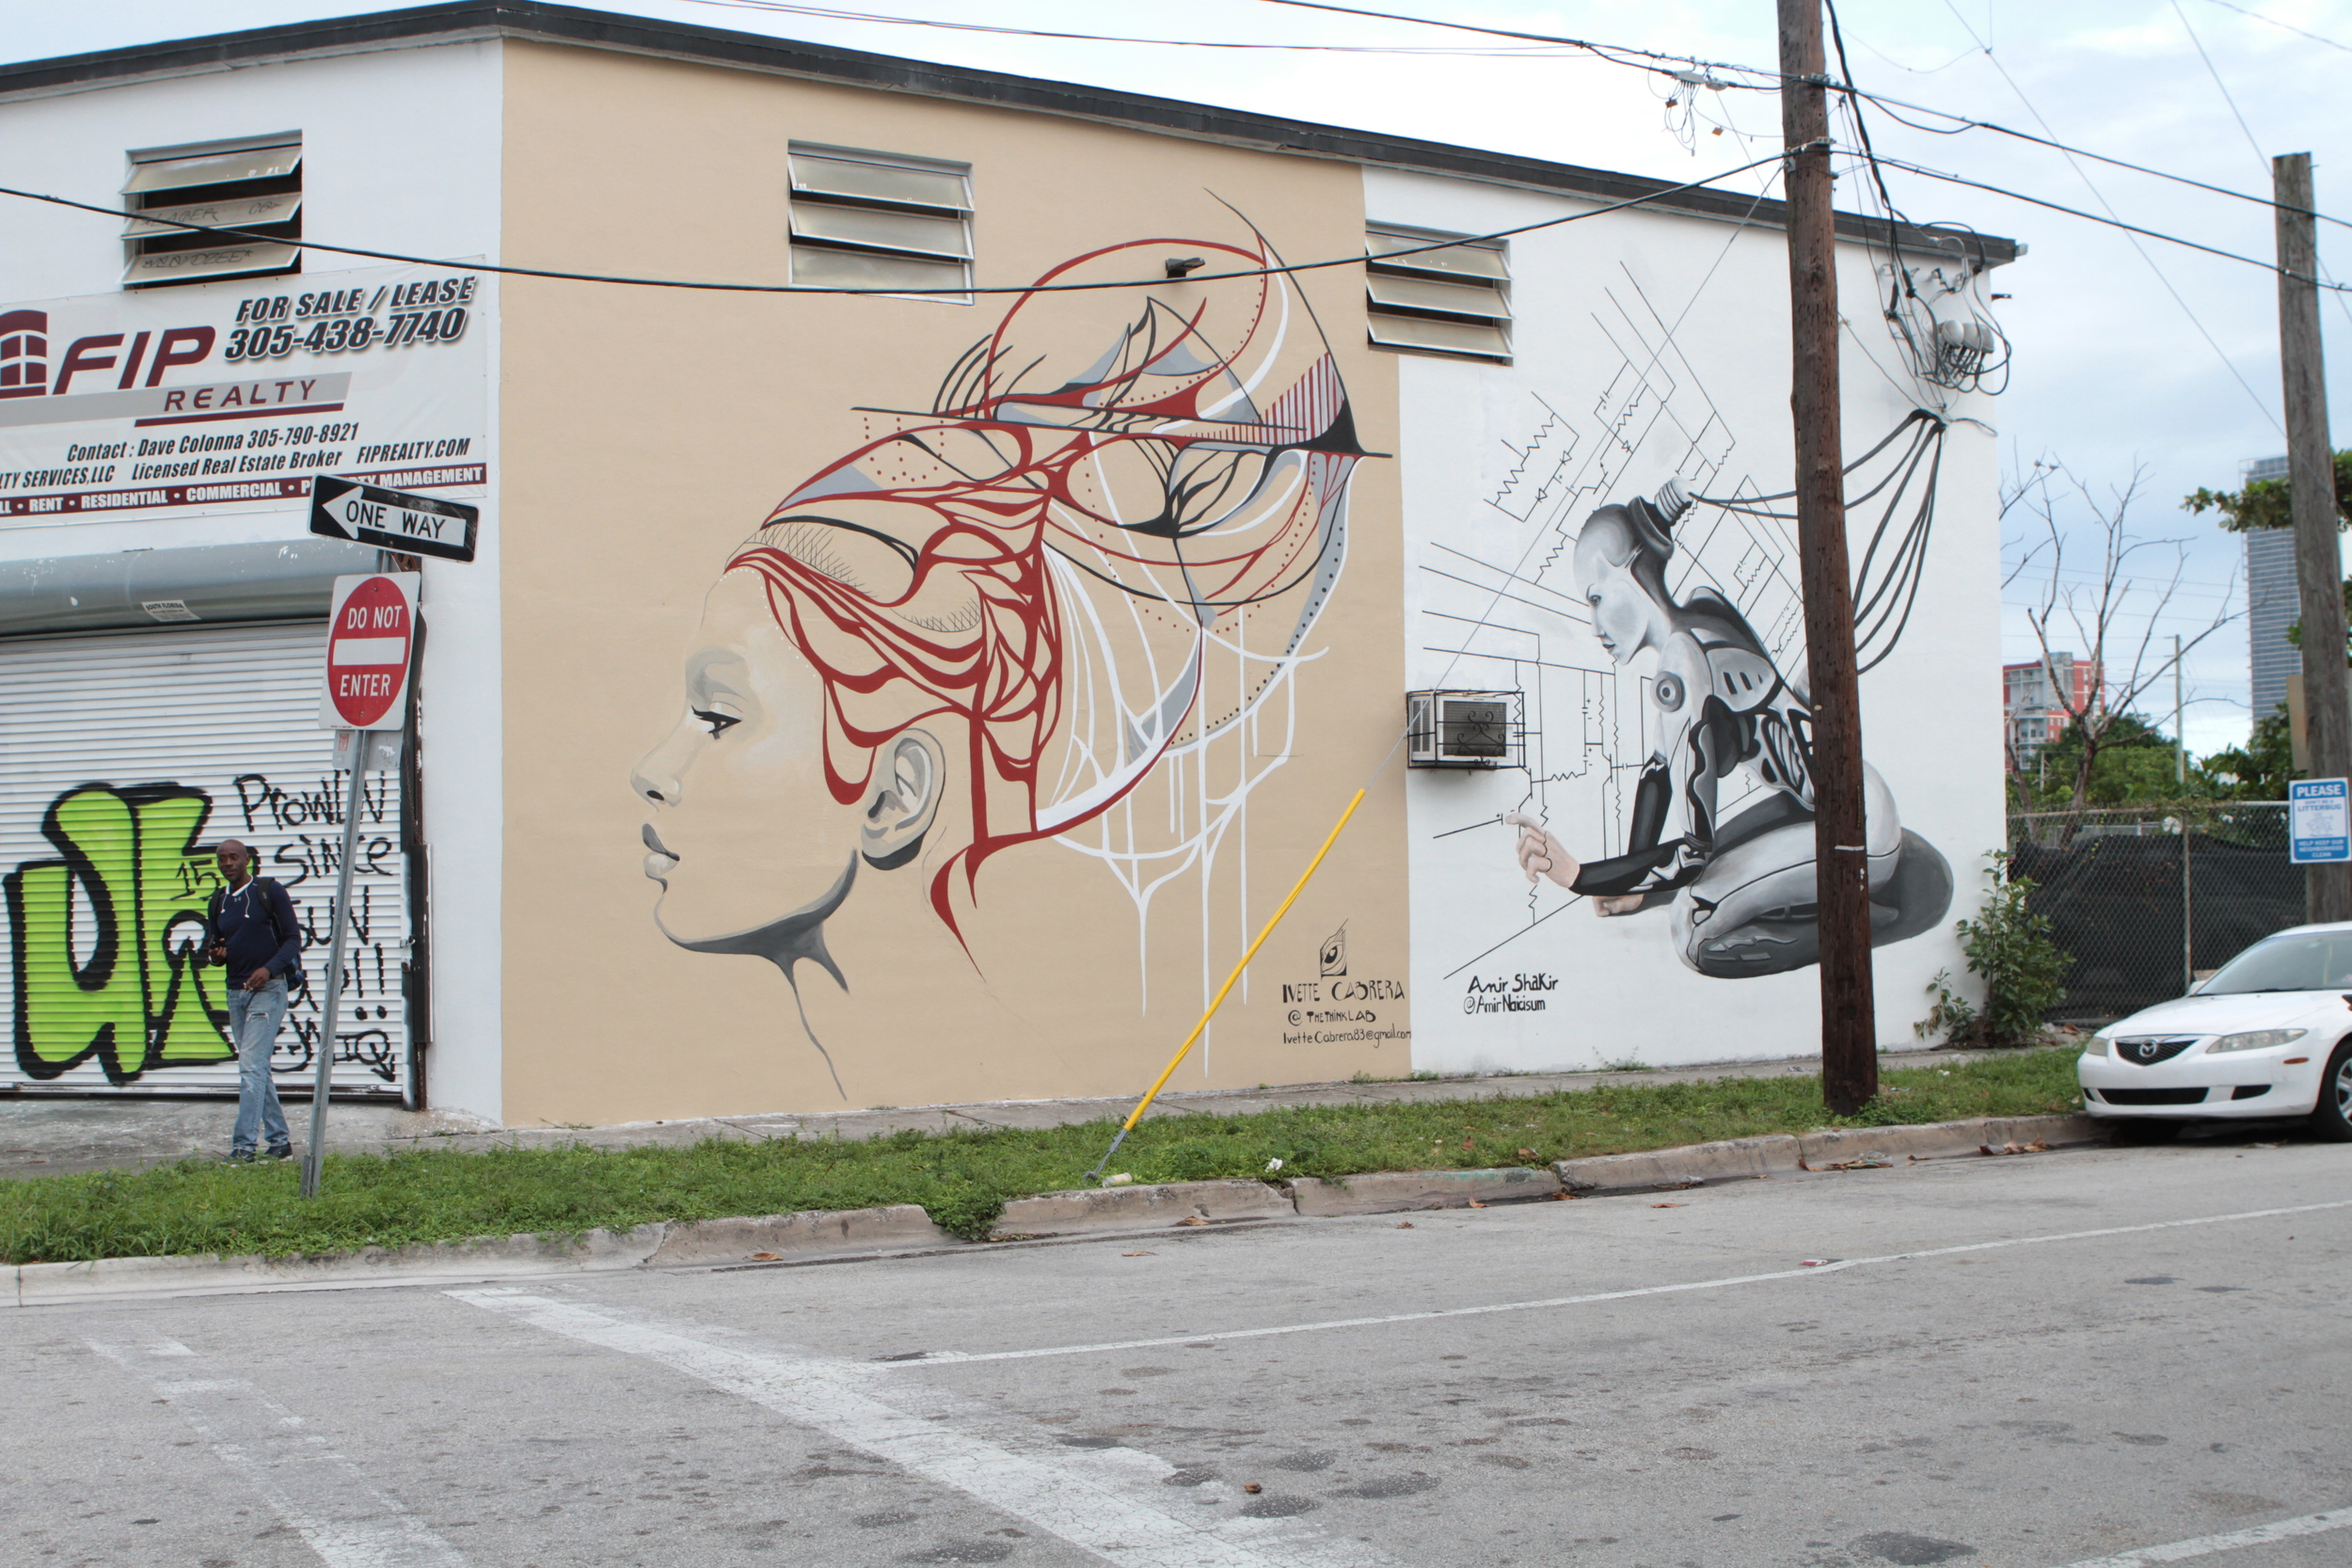 wynwood-arts-district-mural-ivette-cabrera-amir-shakir